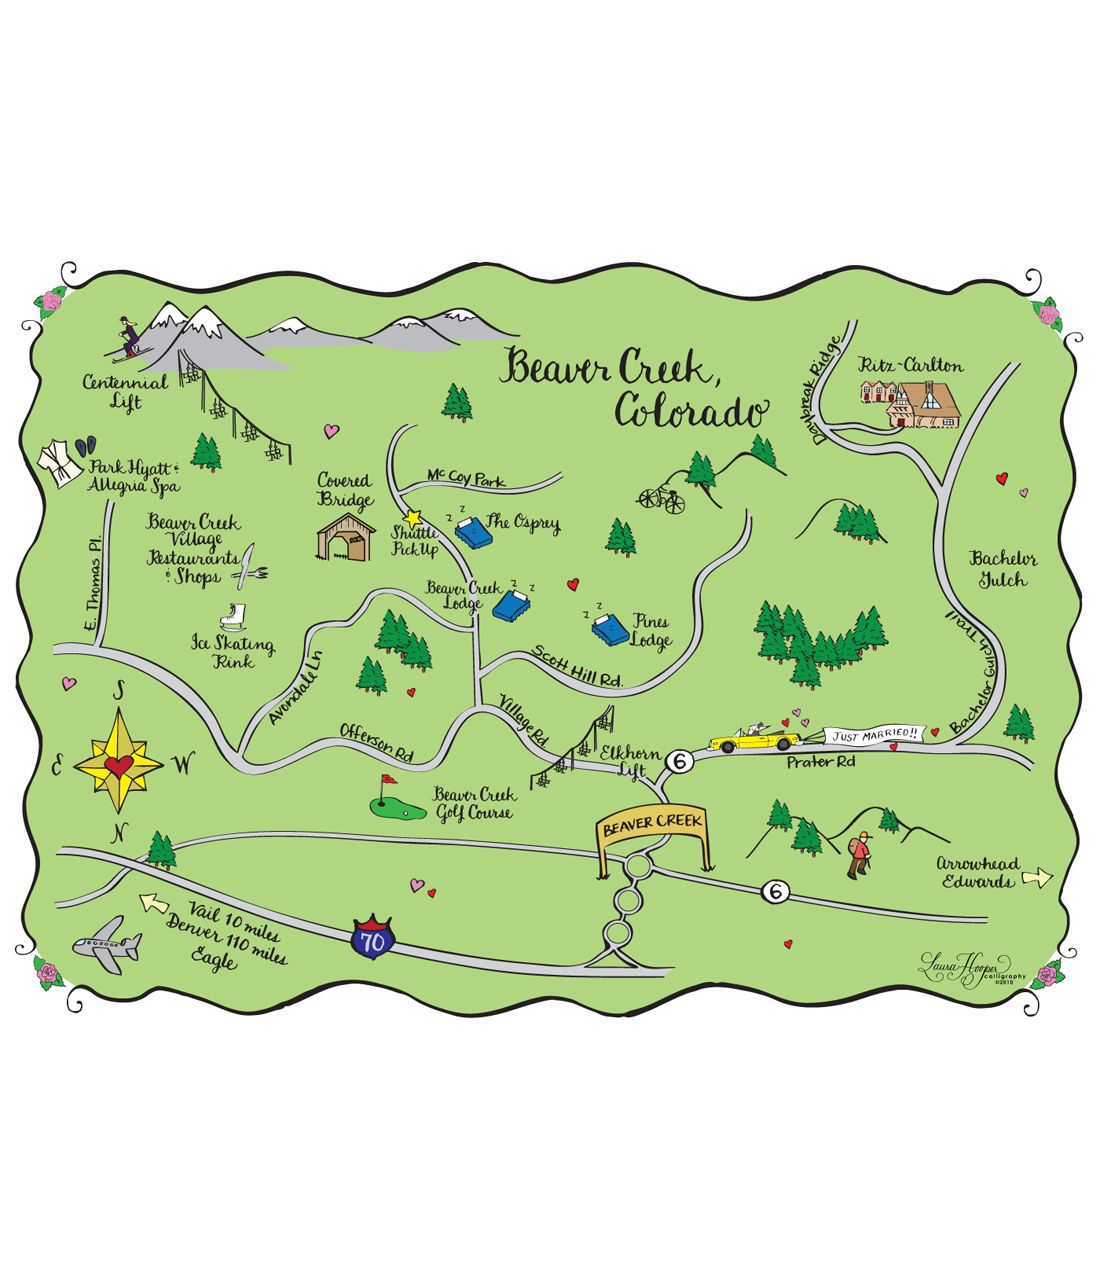 Beaver Creek Co Wedding Map Tote Bags Info Card Pinterest